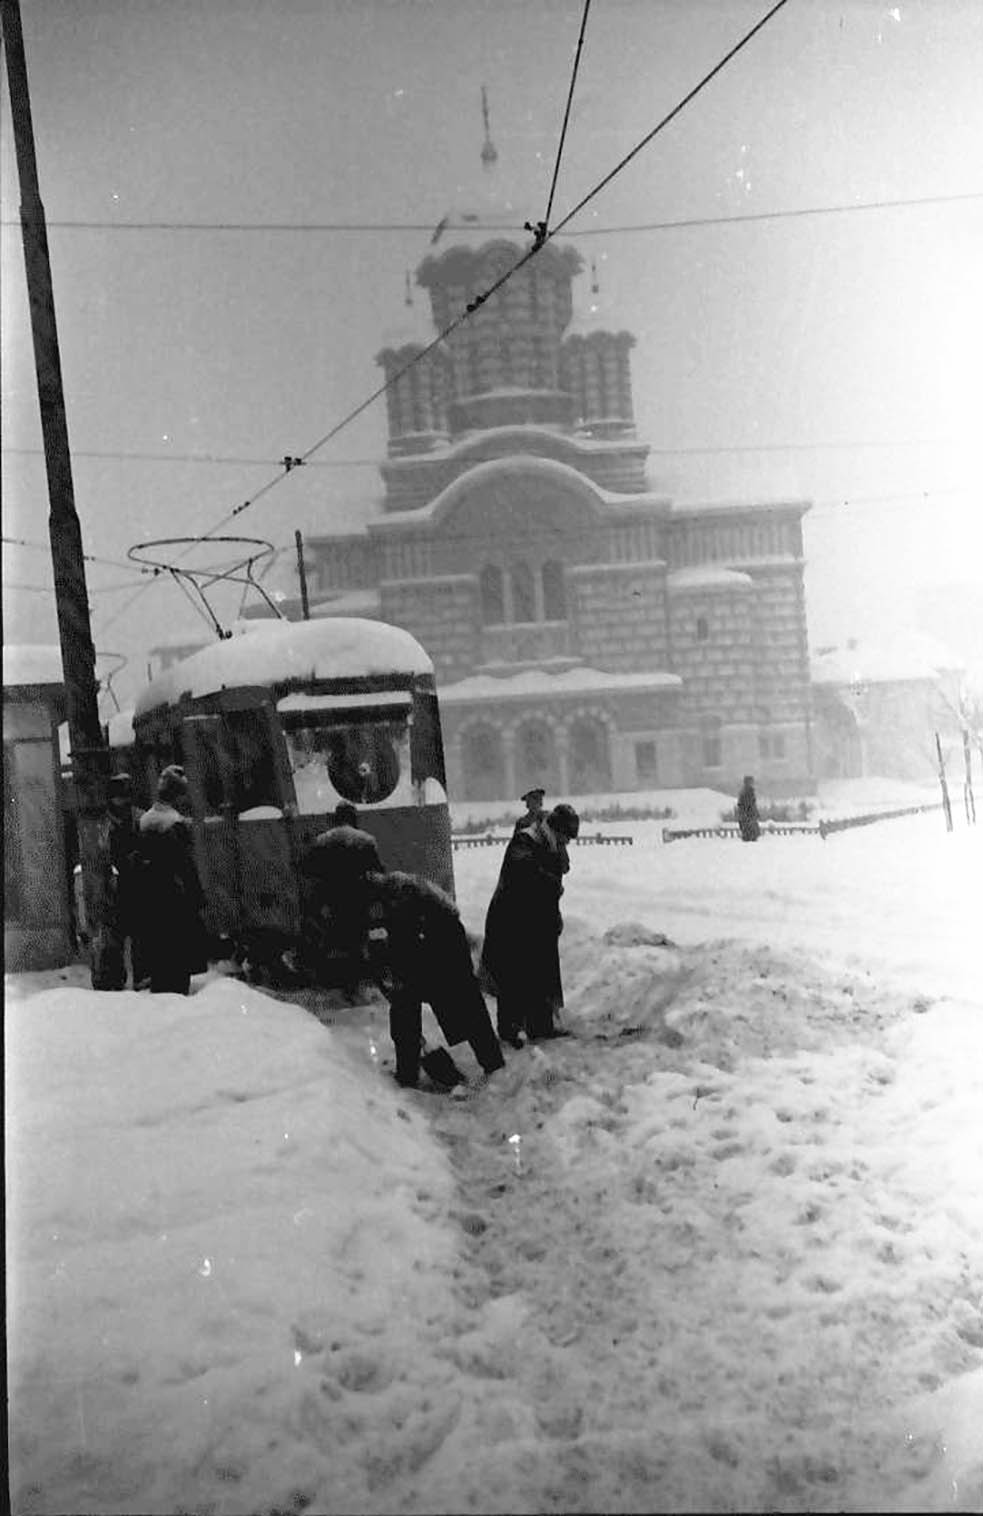 willy pragher - piata operei biserica sf elefterie 1941 iarna in cartierul cotroceni imagini vechi bucuresti foto1